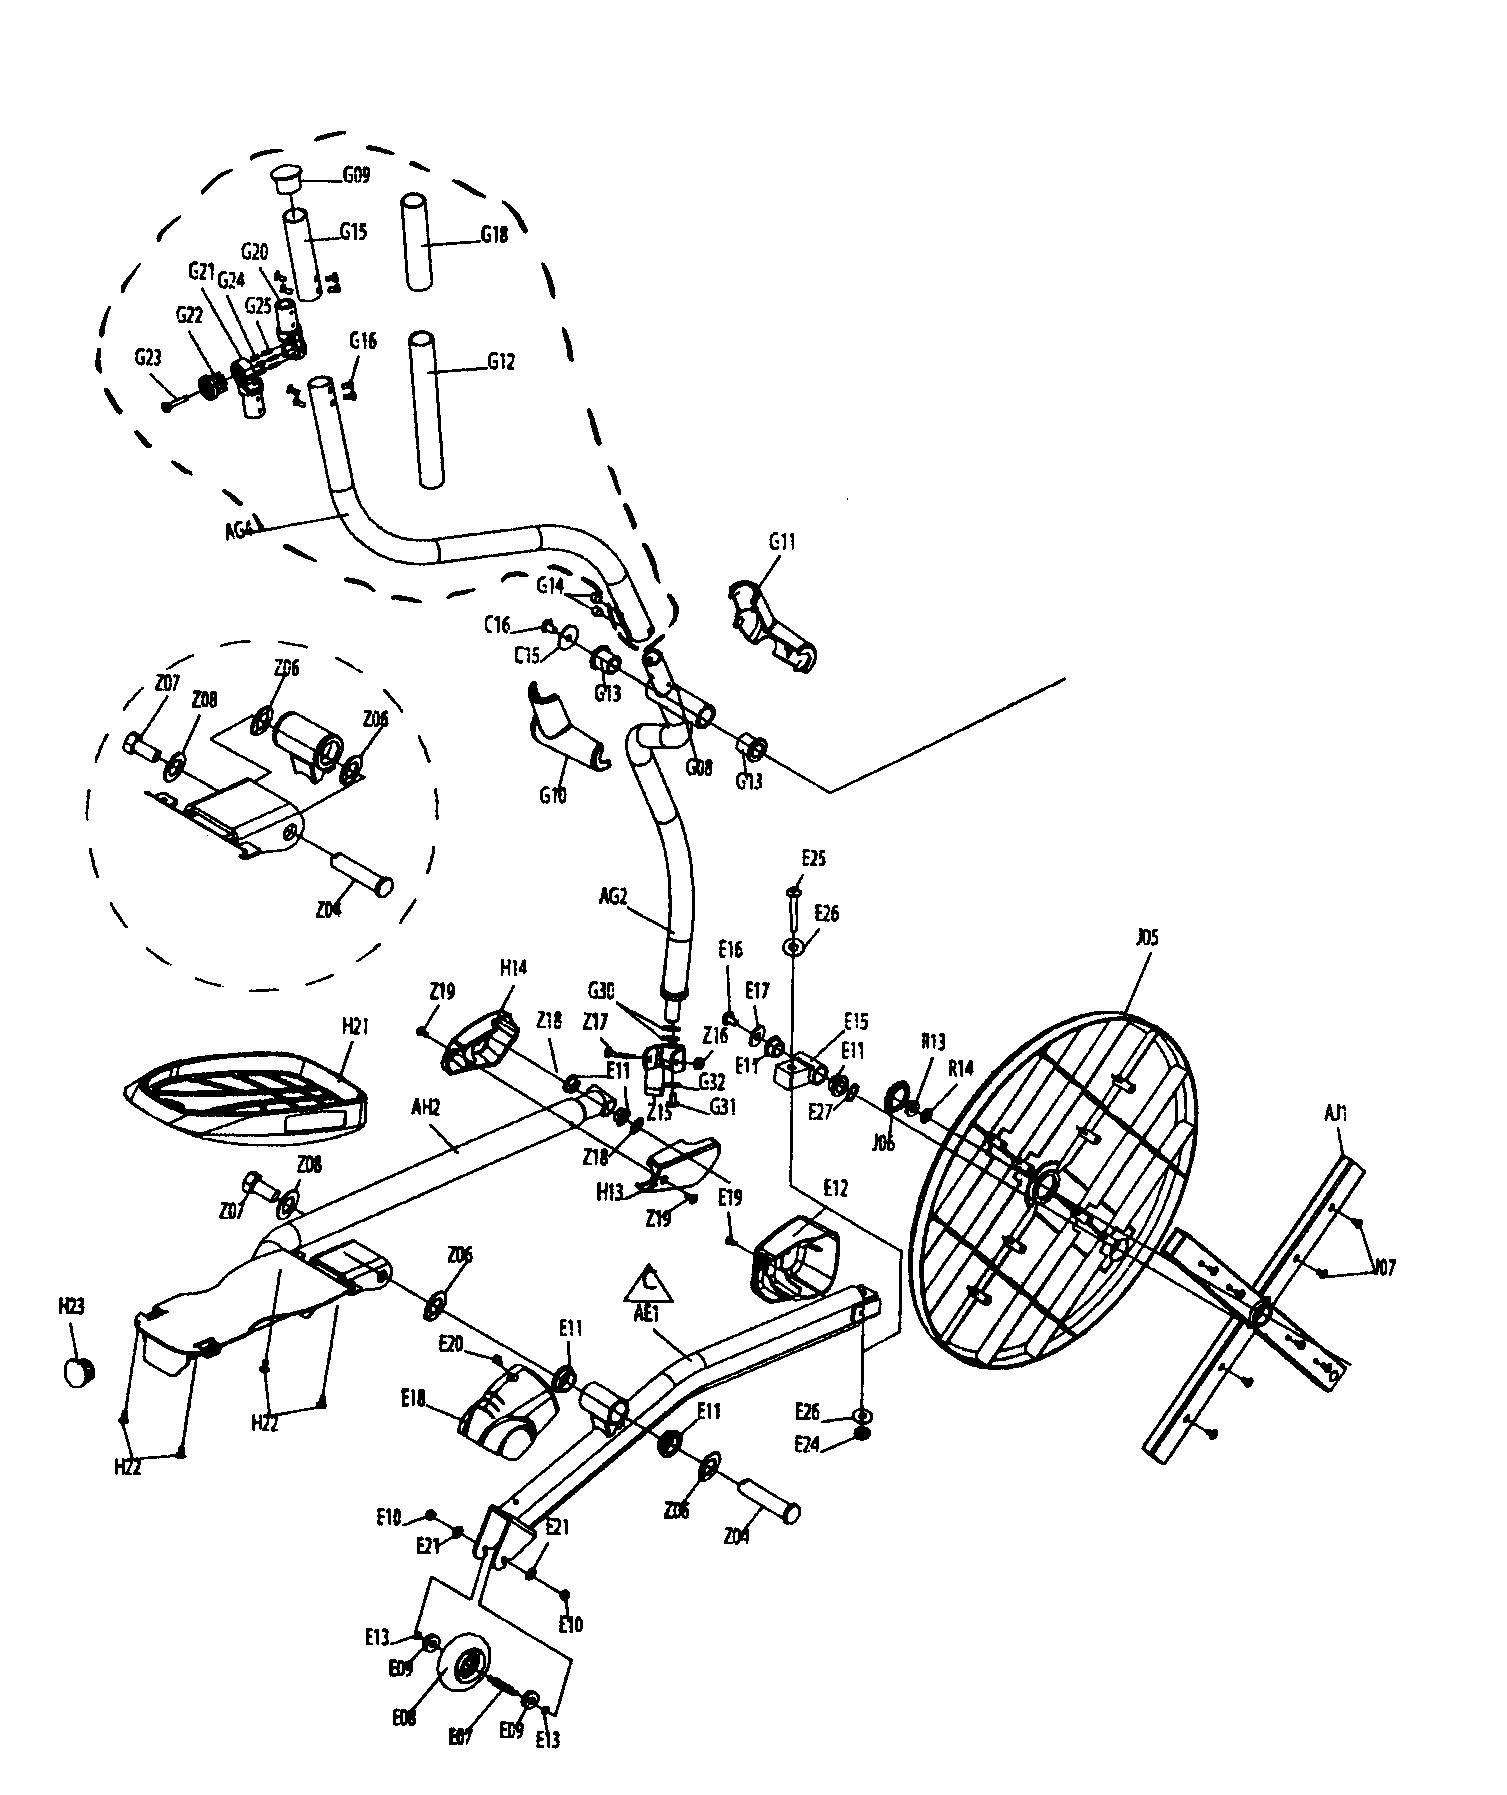 FRAME ASSY Diagram & Parts List for Model SXE77 Horizon